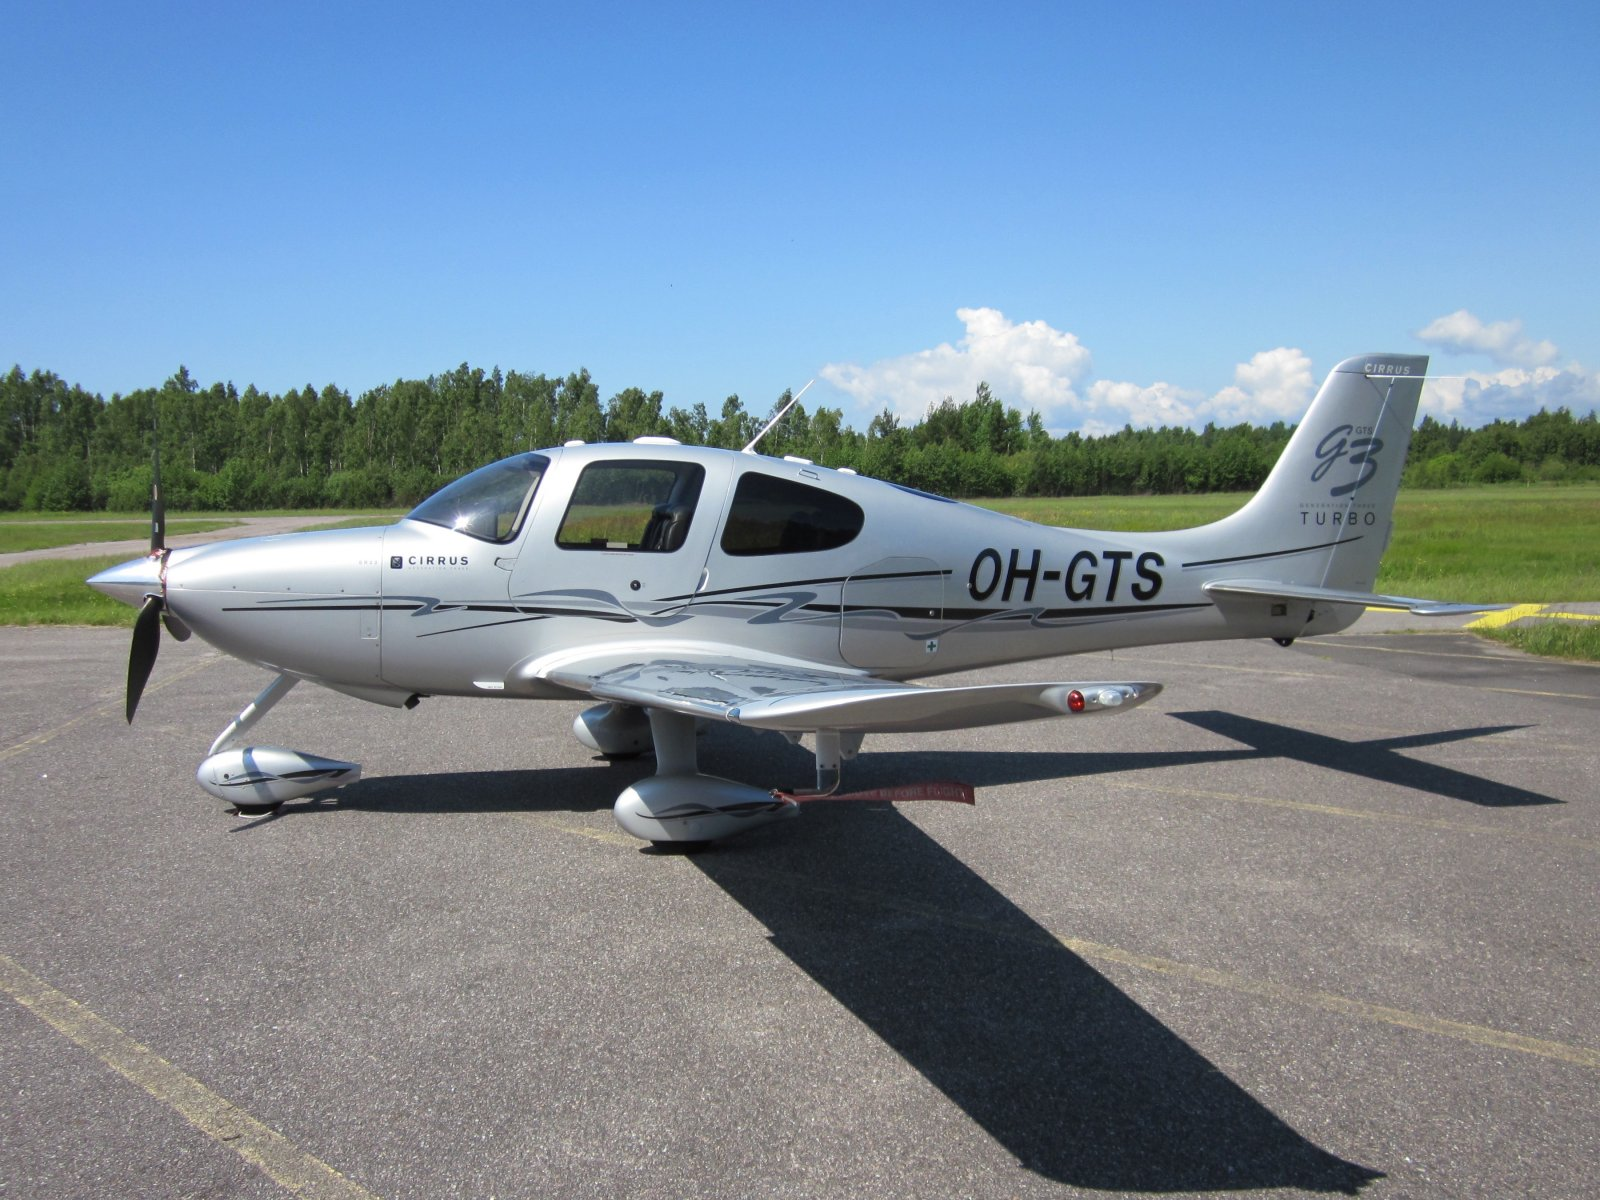 Cirrus SR22-GTS G3 Turbo OH-GTS EFHN 2011-06-26